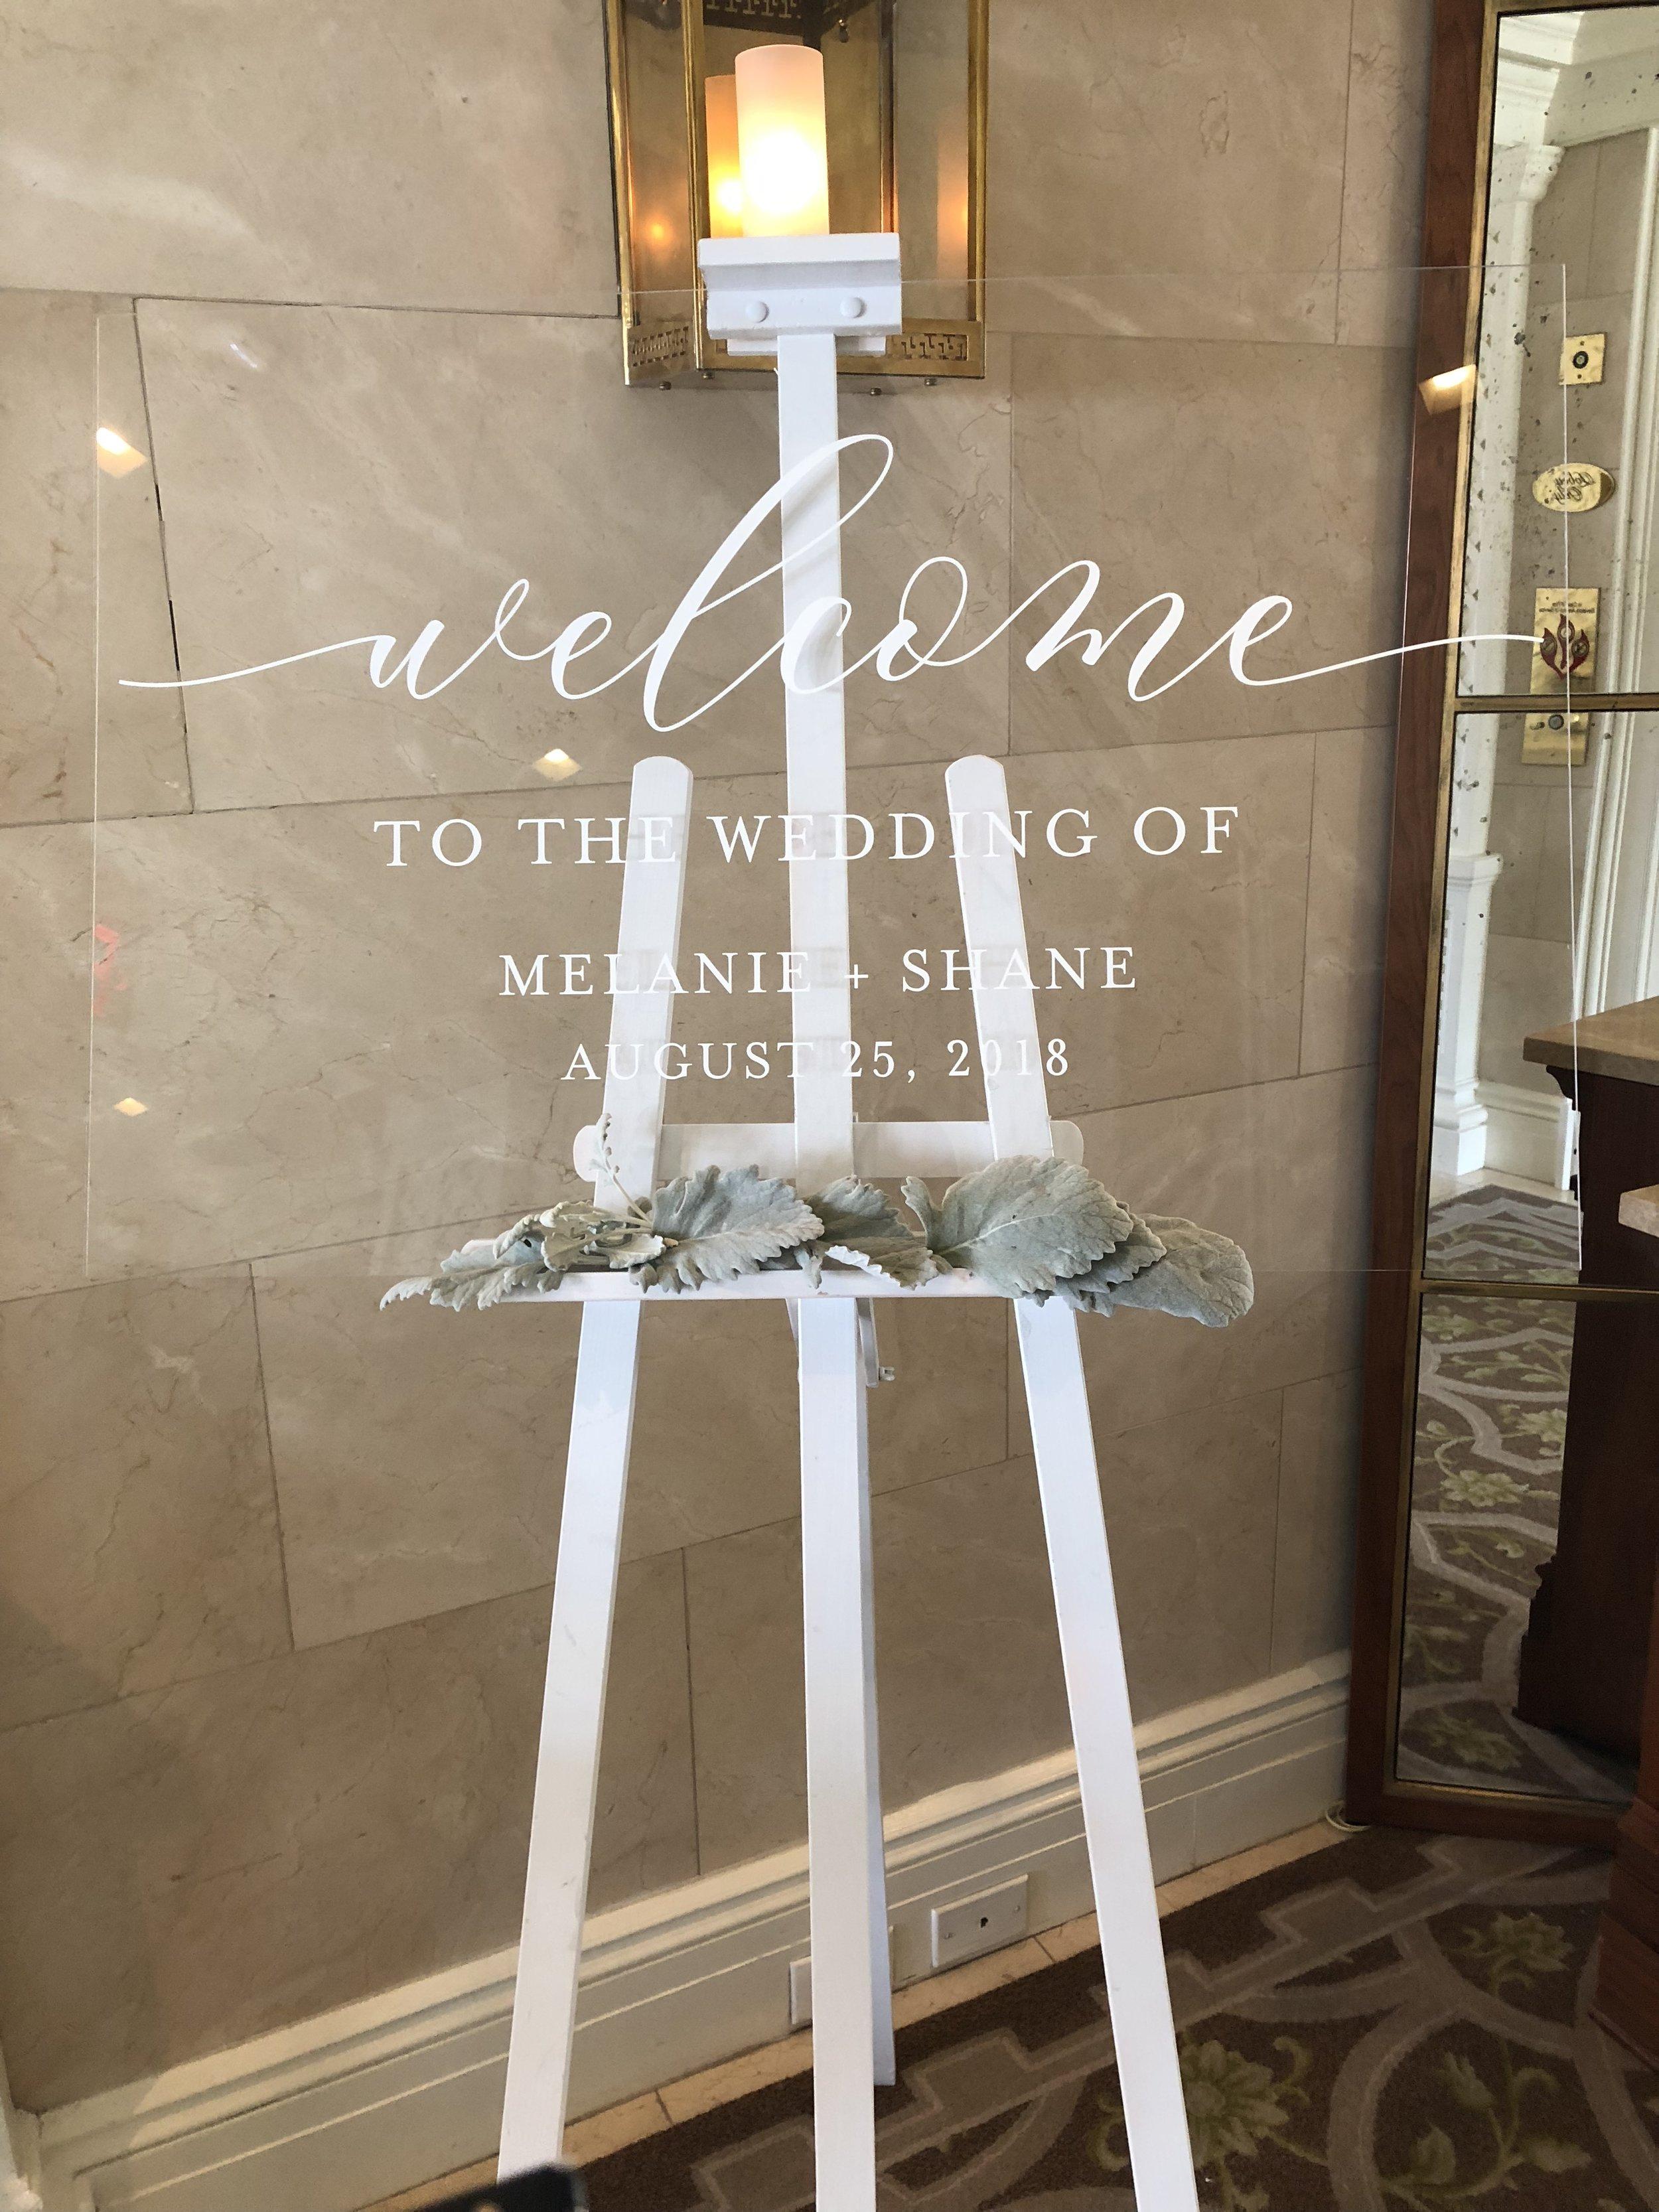 mel+shane acrylic welcome sign.jpeg